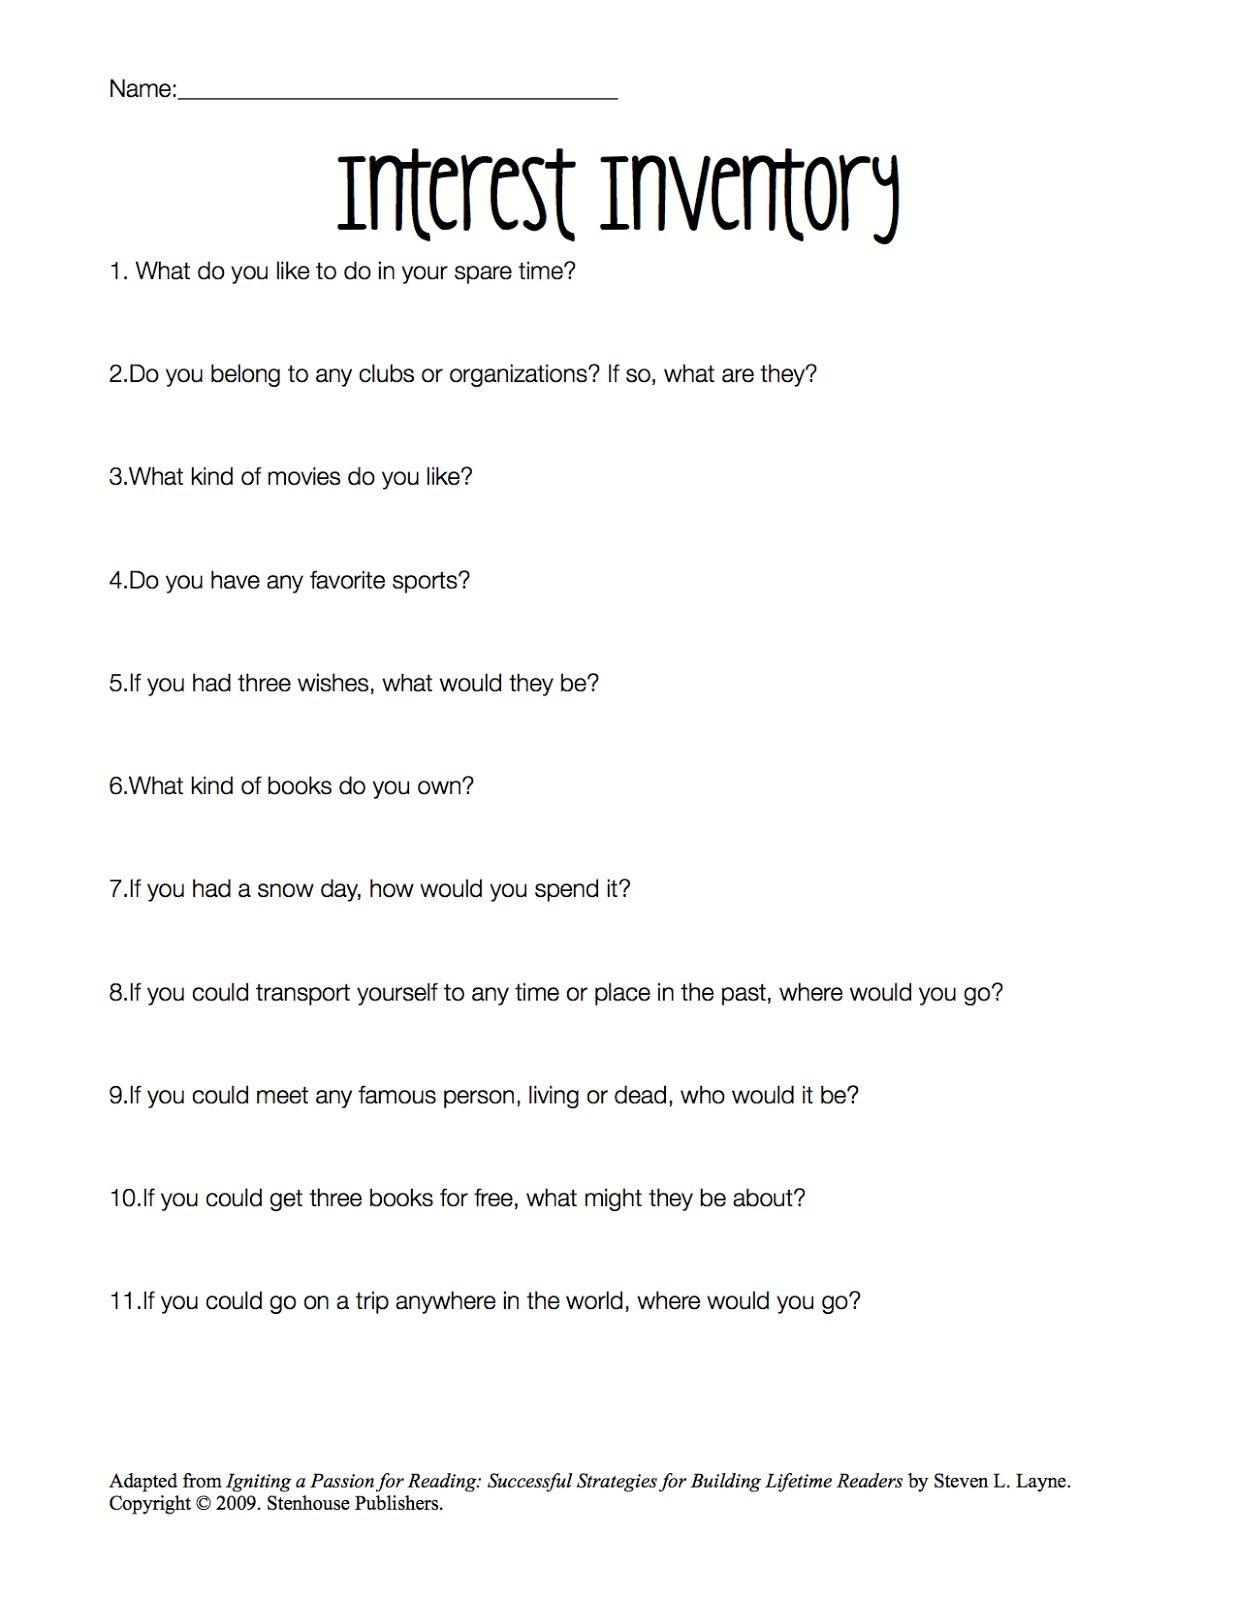 Printable Career Interest Survey For High School Students